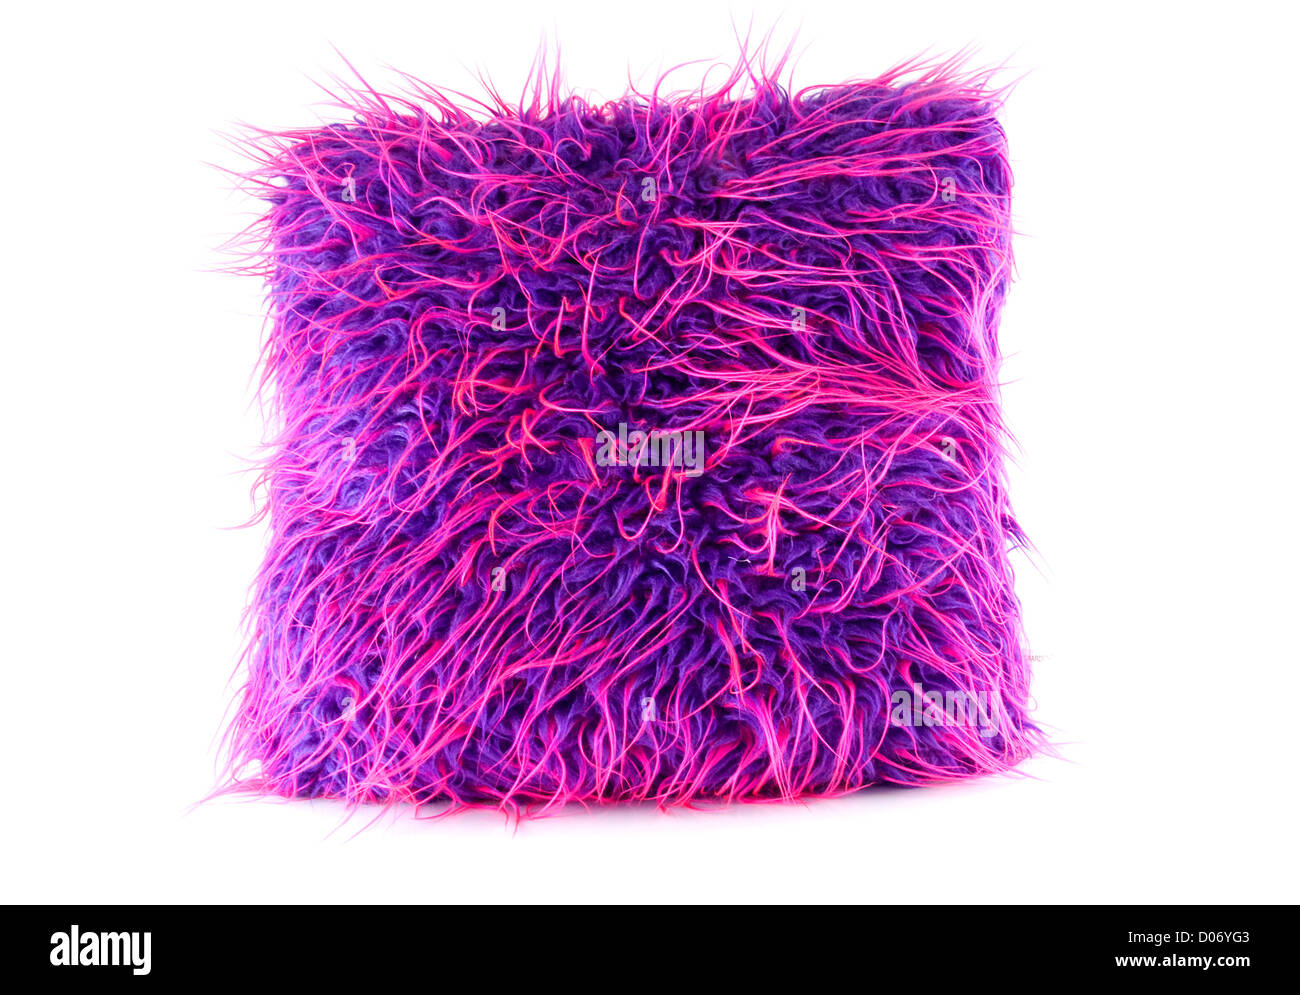 Carta Da Parati Pelosa Rosa : Cuscino rosa immagini cuscino rosa fotos stock alamy